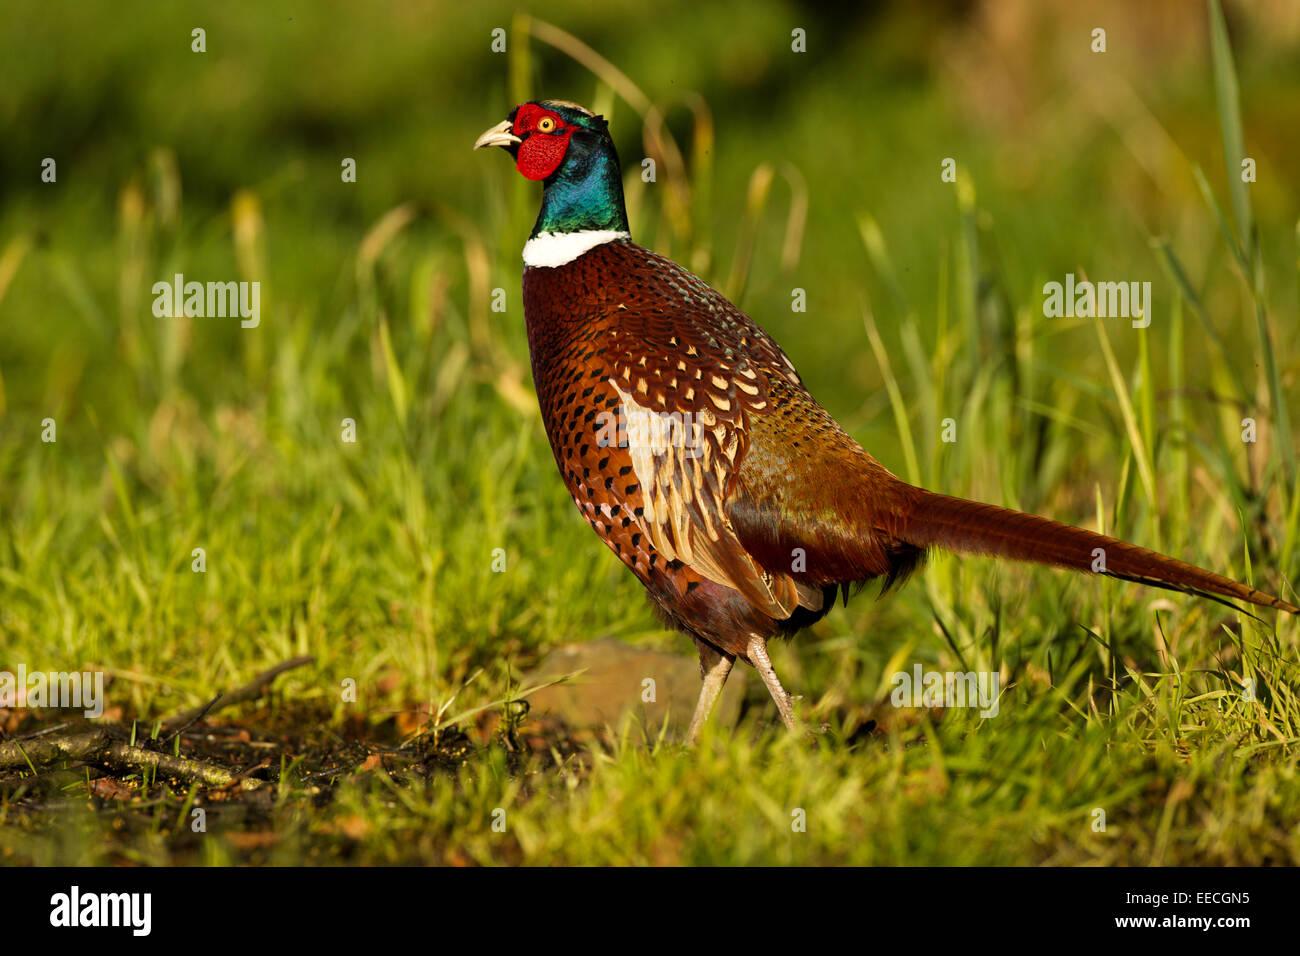 Pheasant Male - Stock Image